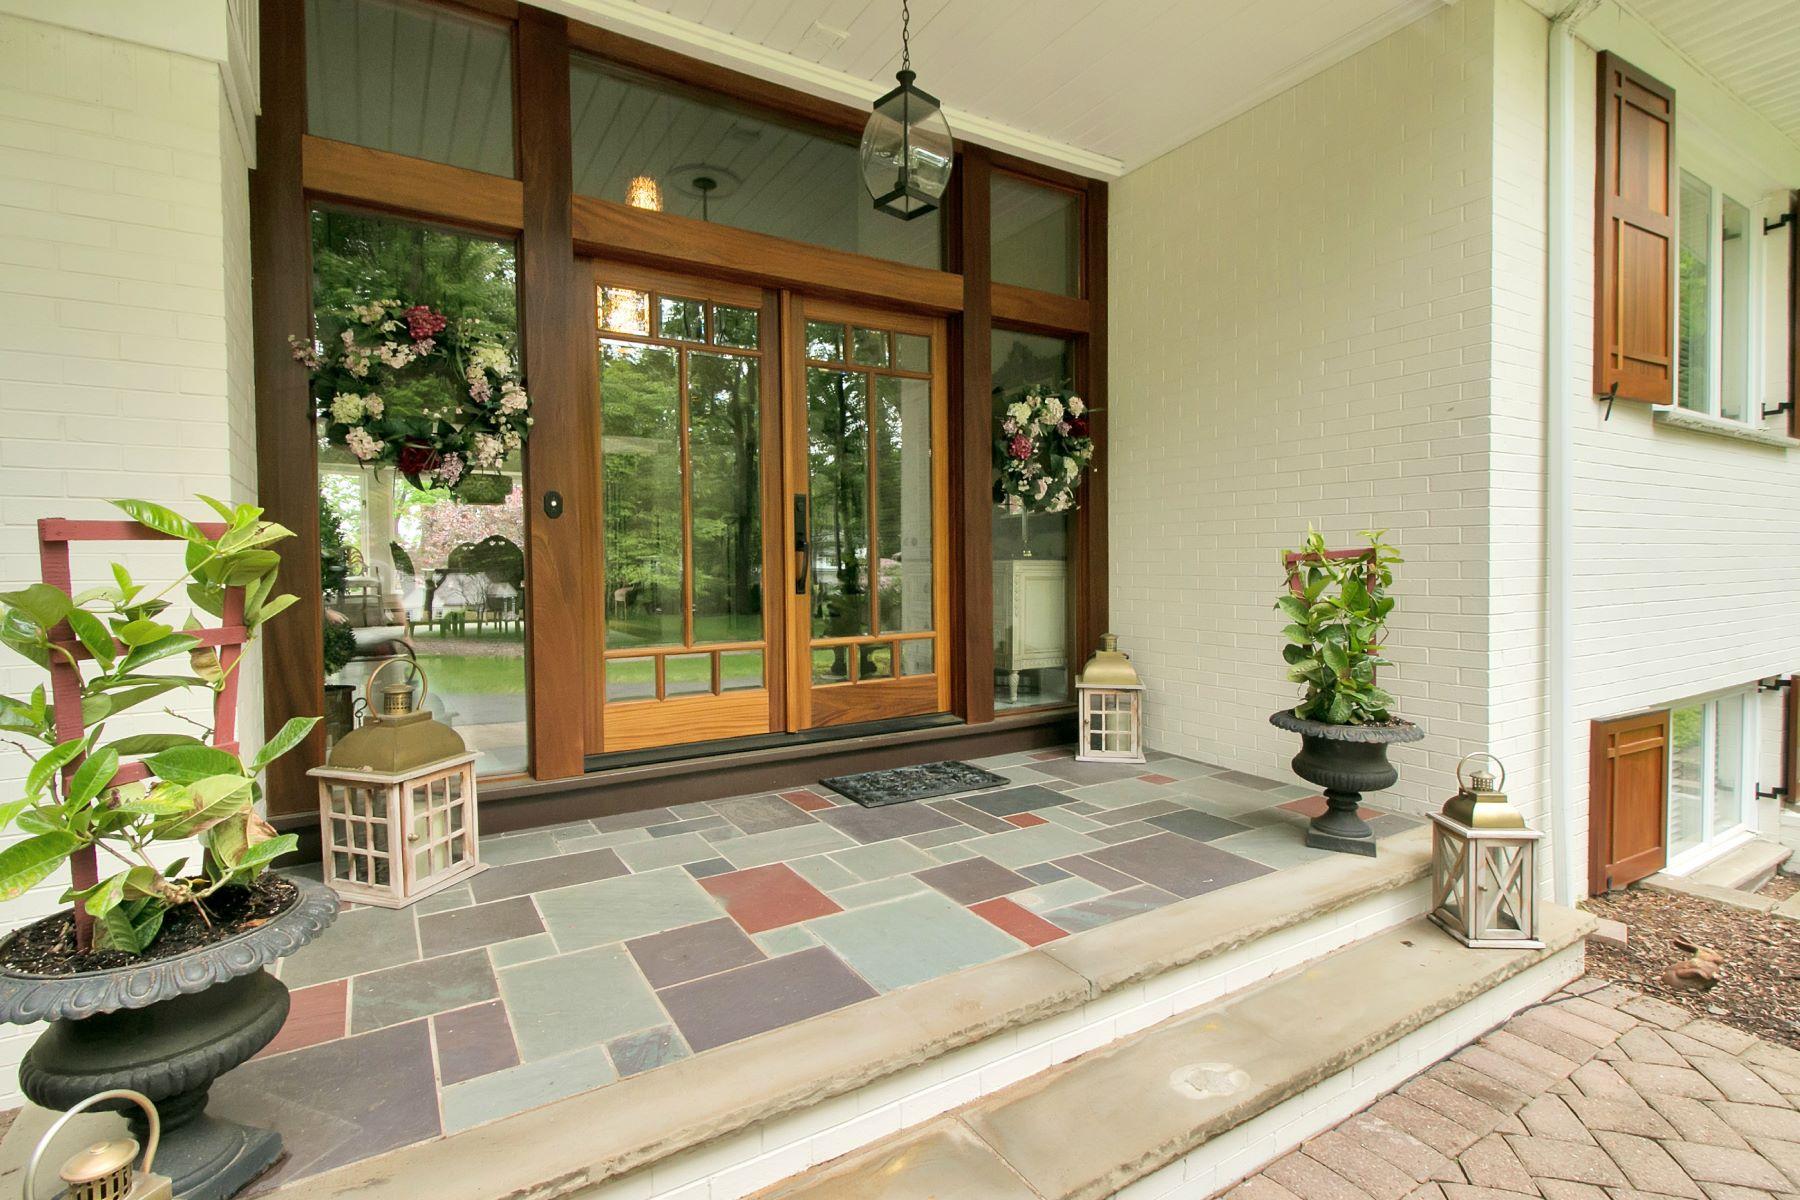 Частный односемейный дом для того Продажа на Breathtaking Lakefront Home 283 Indian Trail Drive Franklin Lakes, 07417 Соединенные Штаты